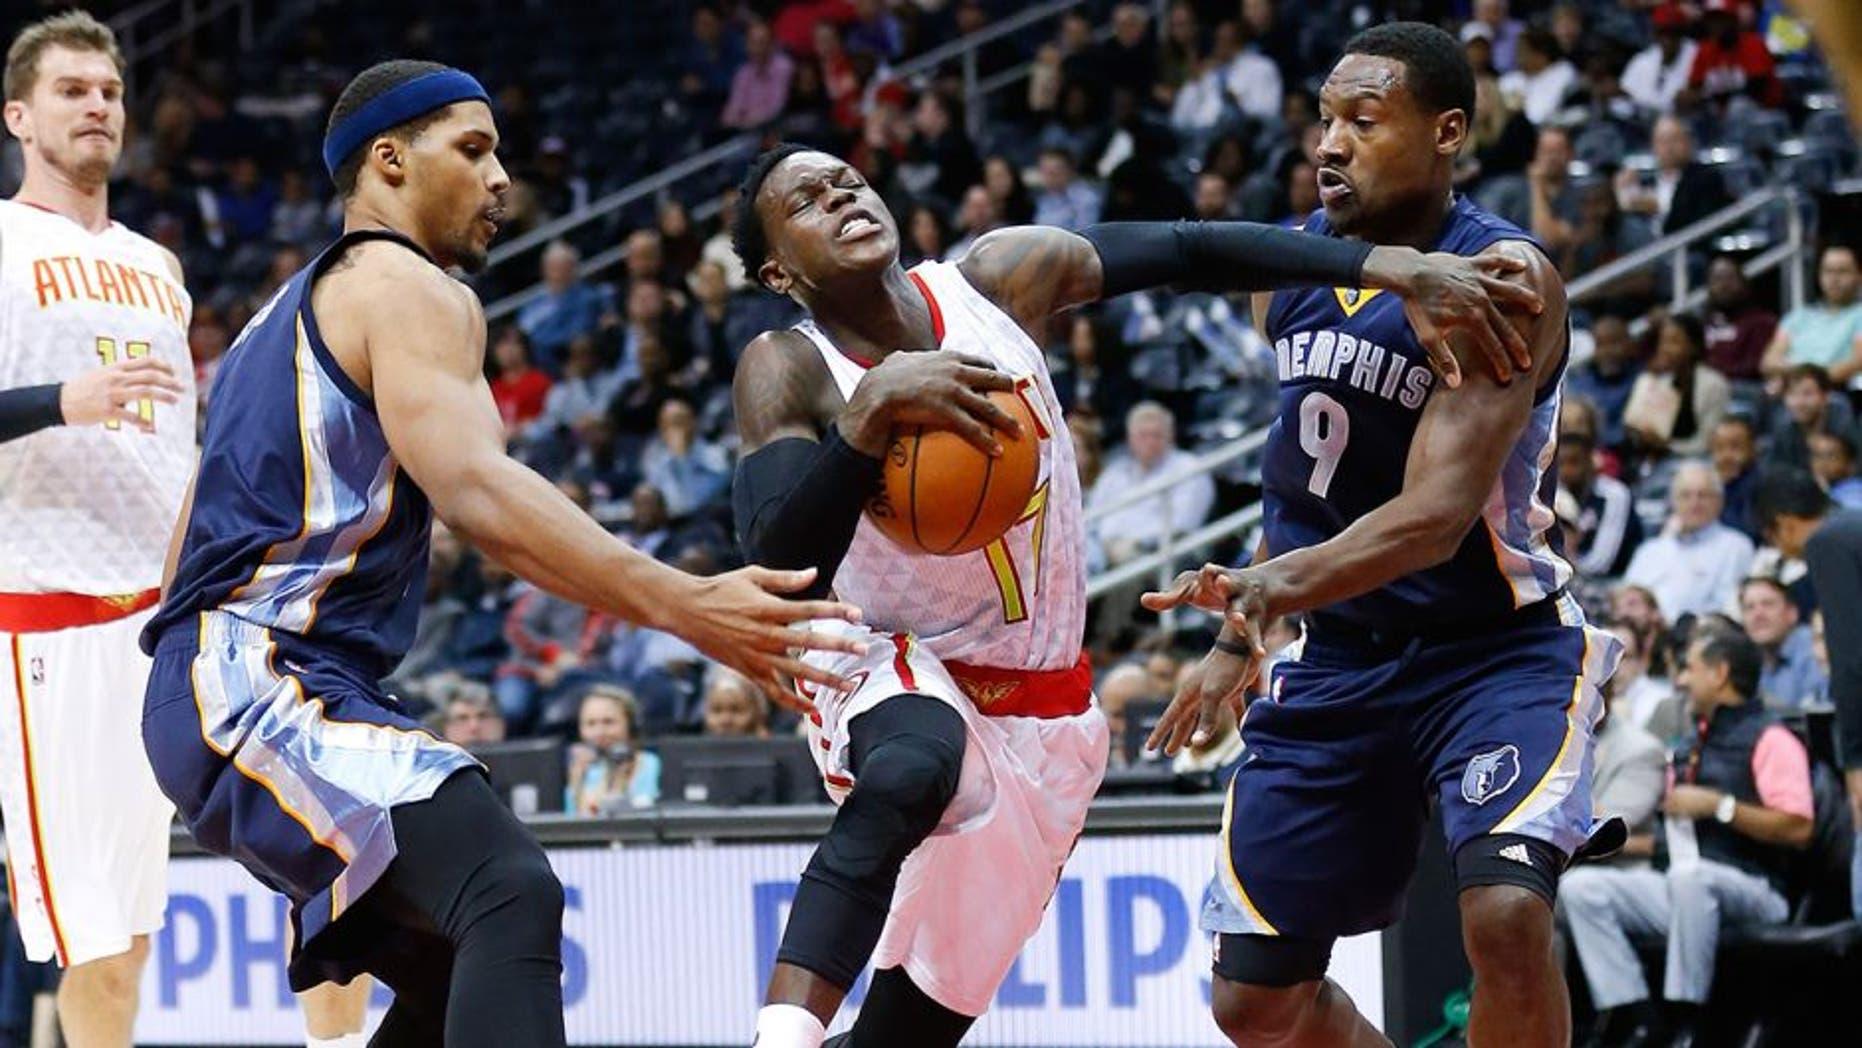 Atlanta Hawks guard Dennis Schroder (17) drives between Memphis Grizzlies' Jarnell Stokes (1) and Tony Allen (9) in the first half of an NBA basketball game Wednesday, Oct. 21, 2015, in Atlanta. (AP Photo/John Bazemore)